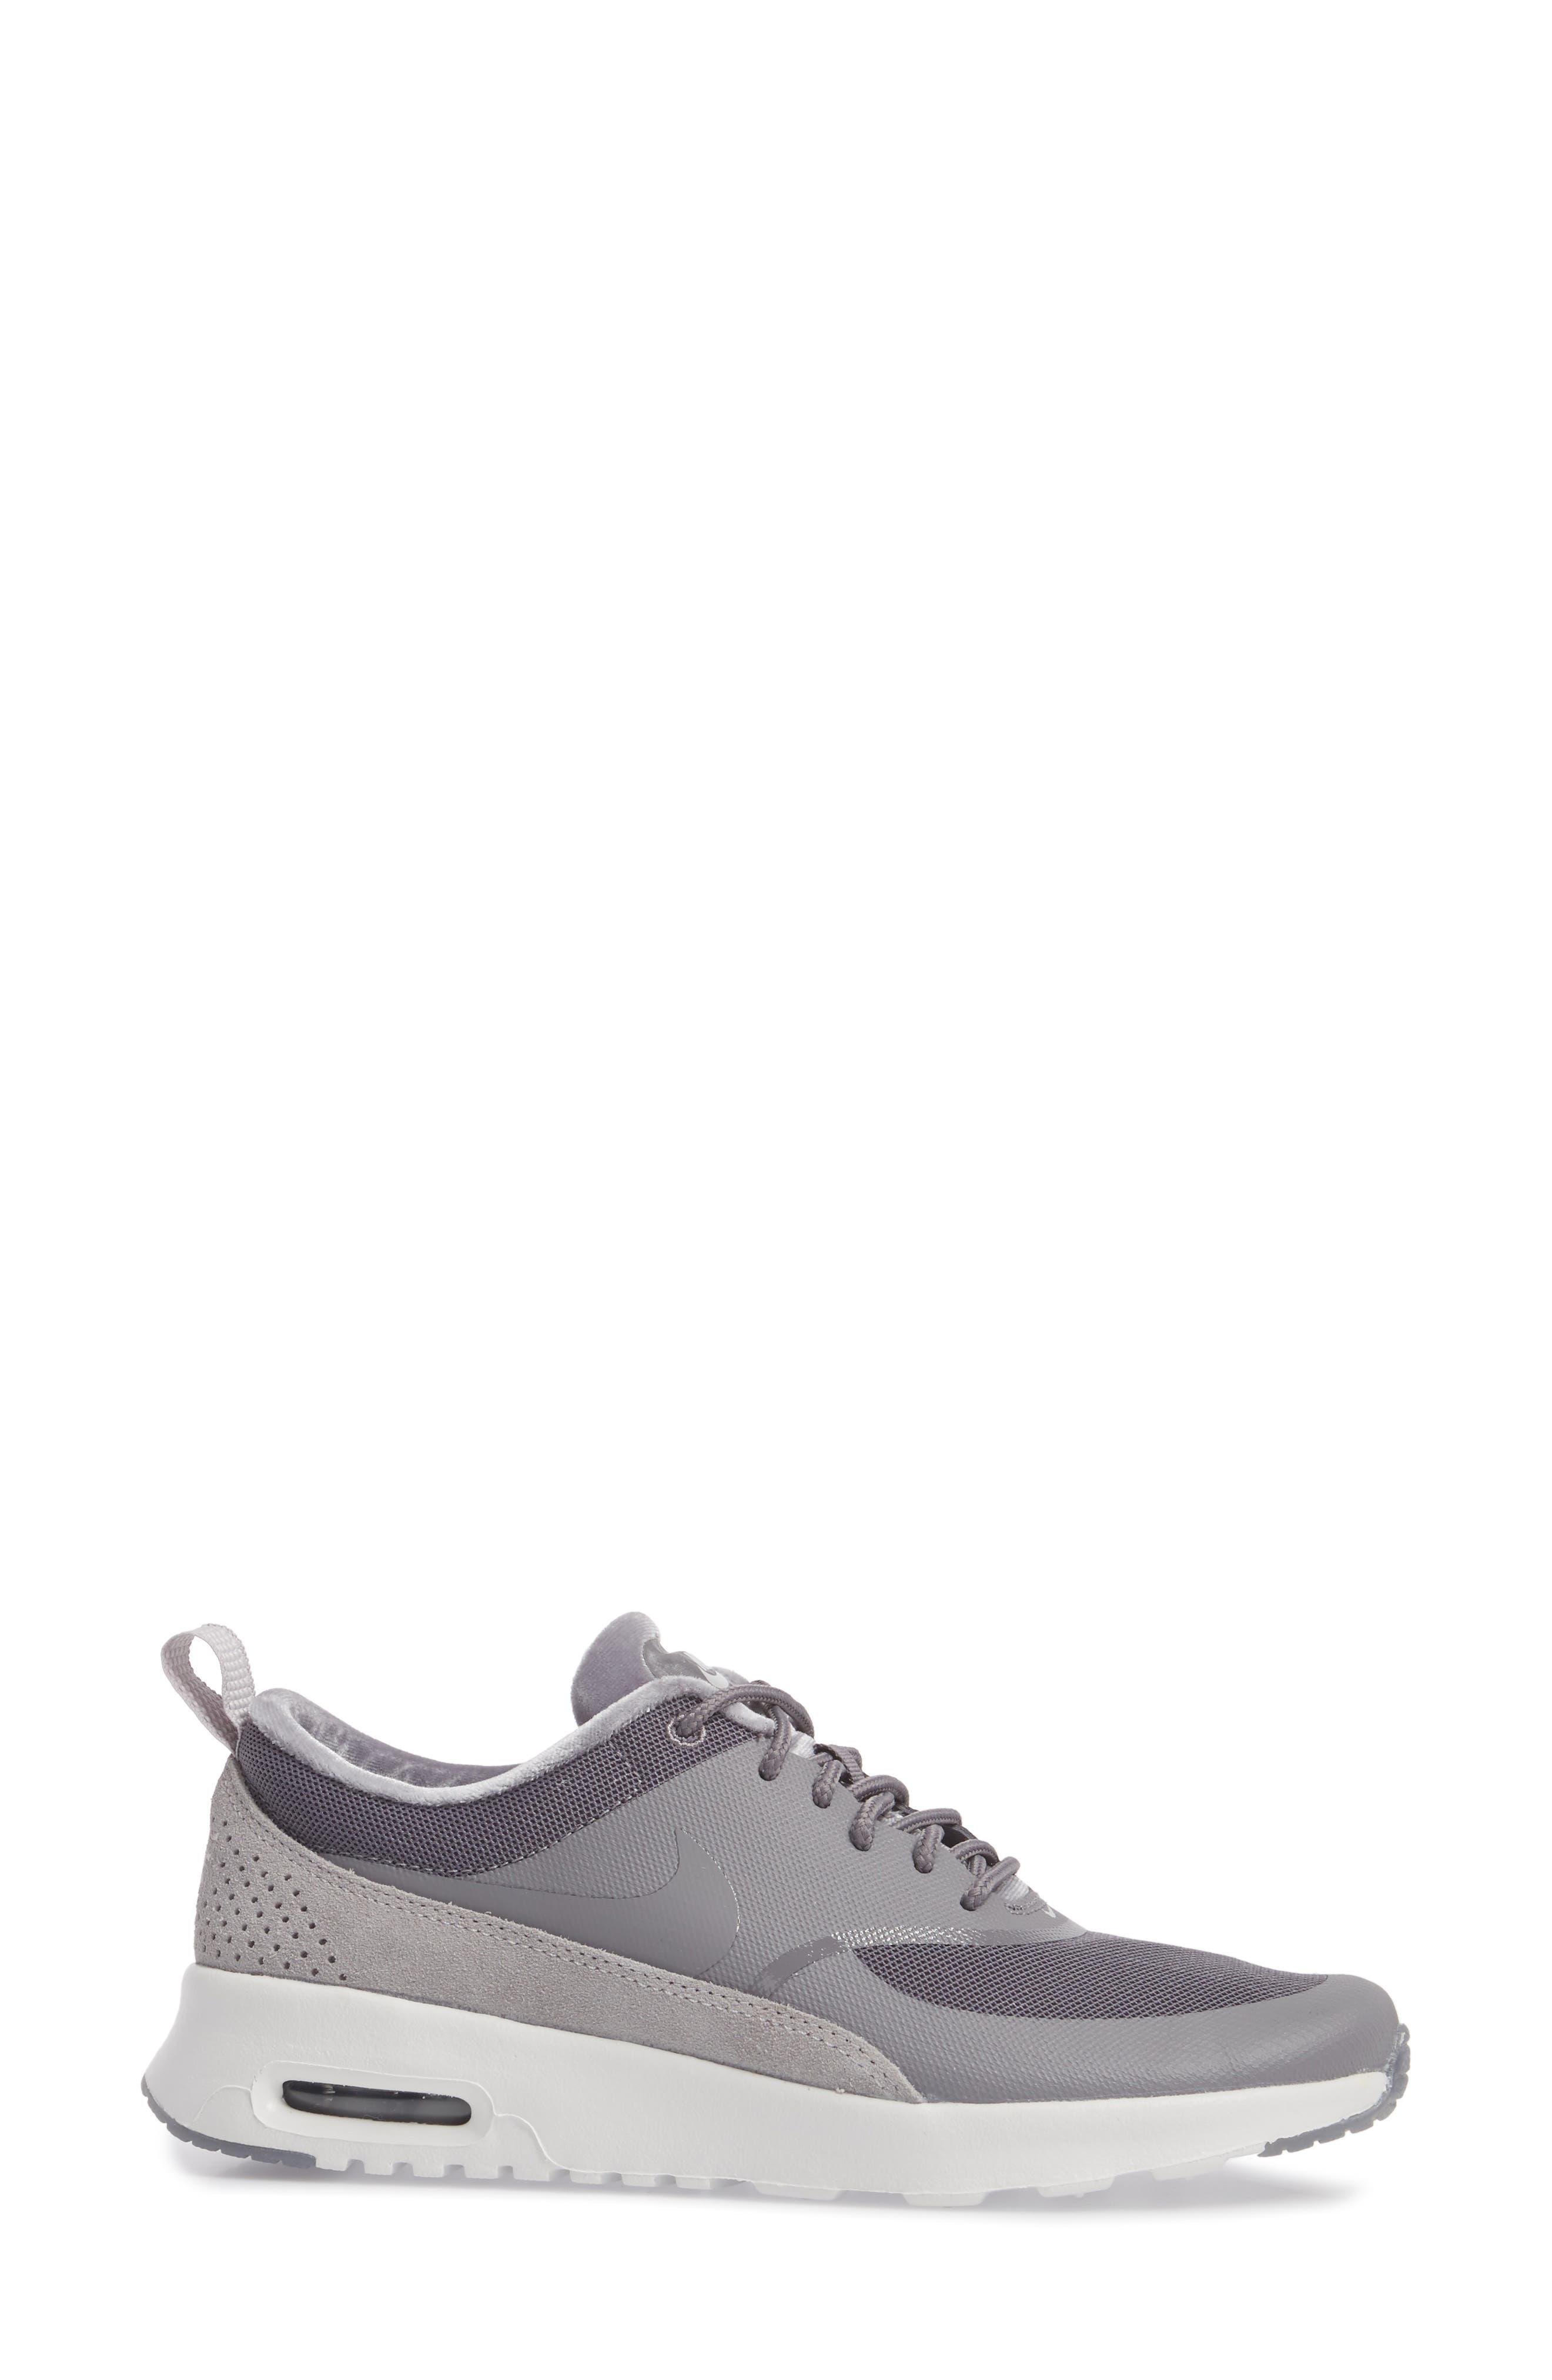 Air Max Thea LX Sneaker,                             Alternate thumbnail 3, color,                             022